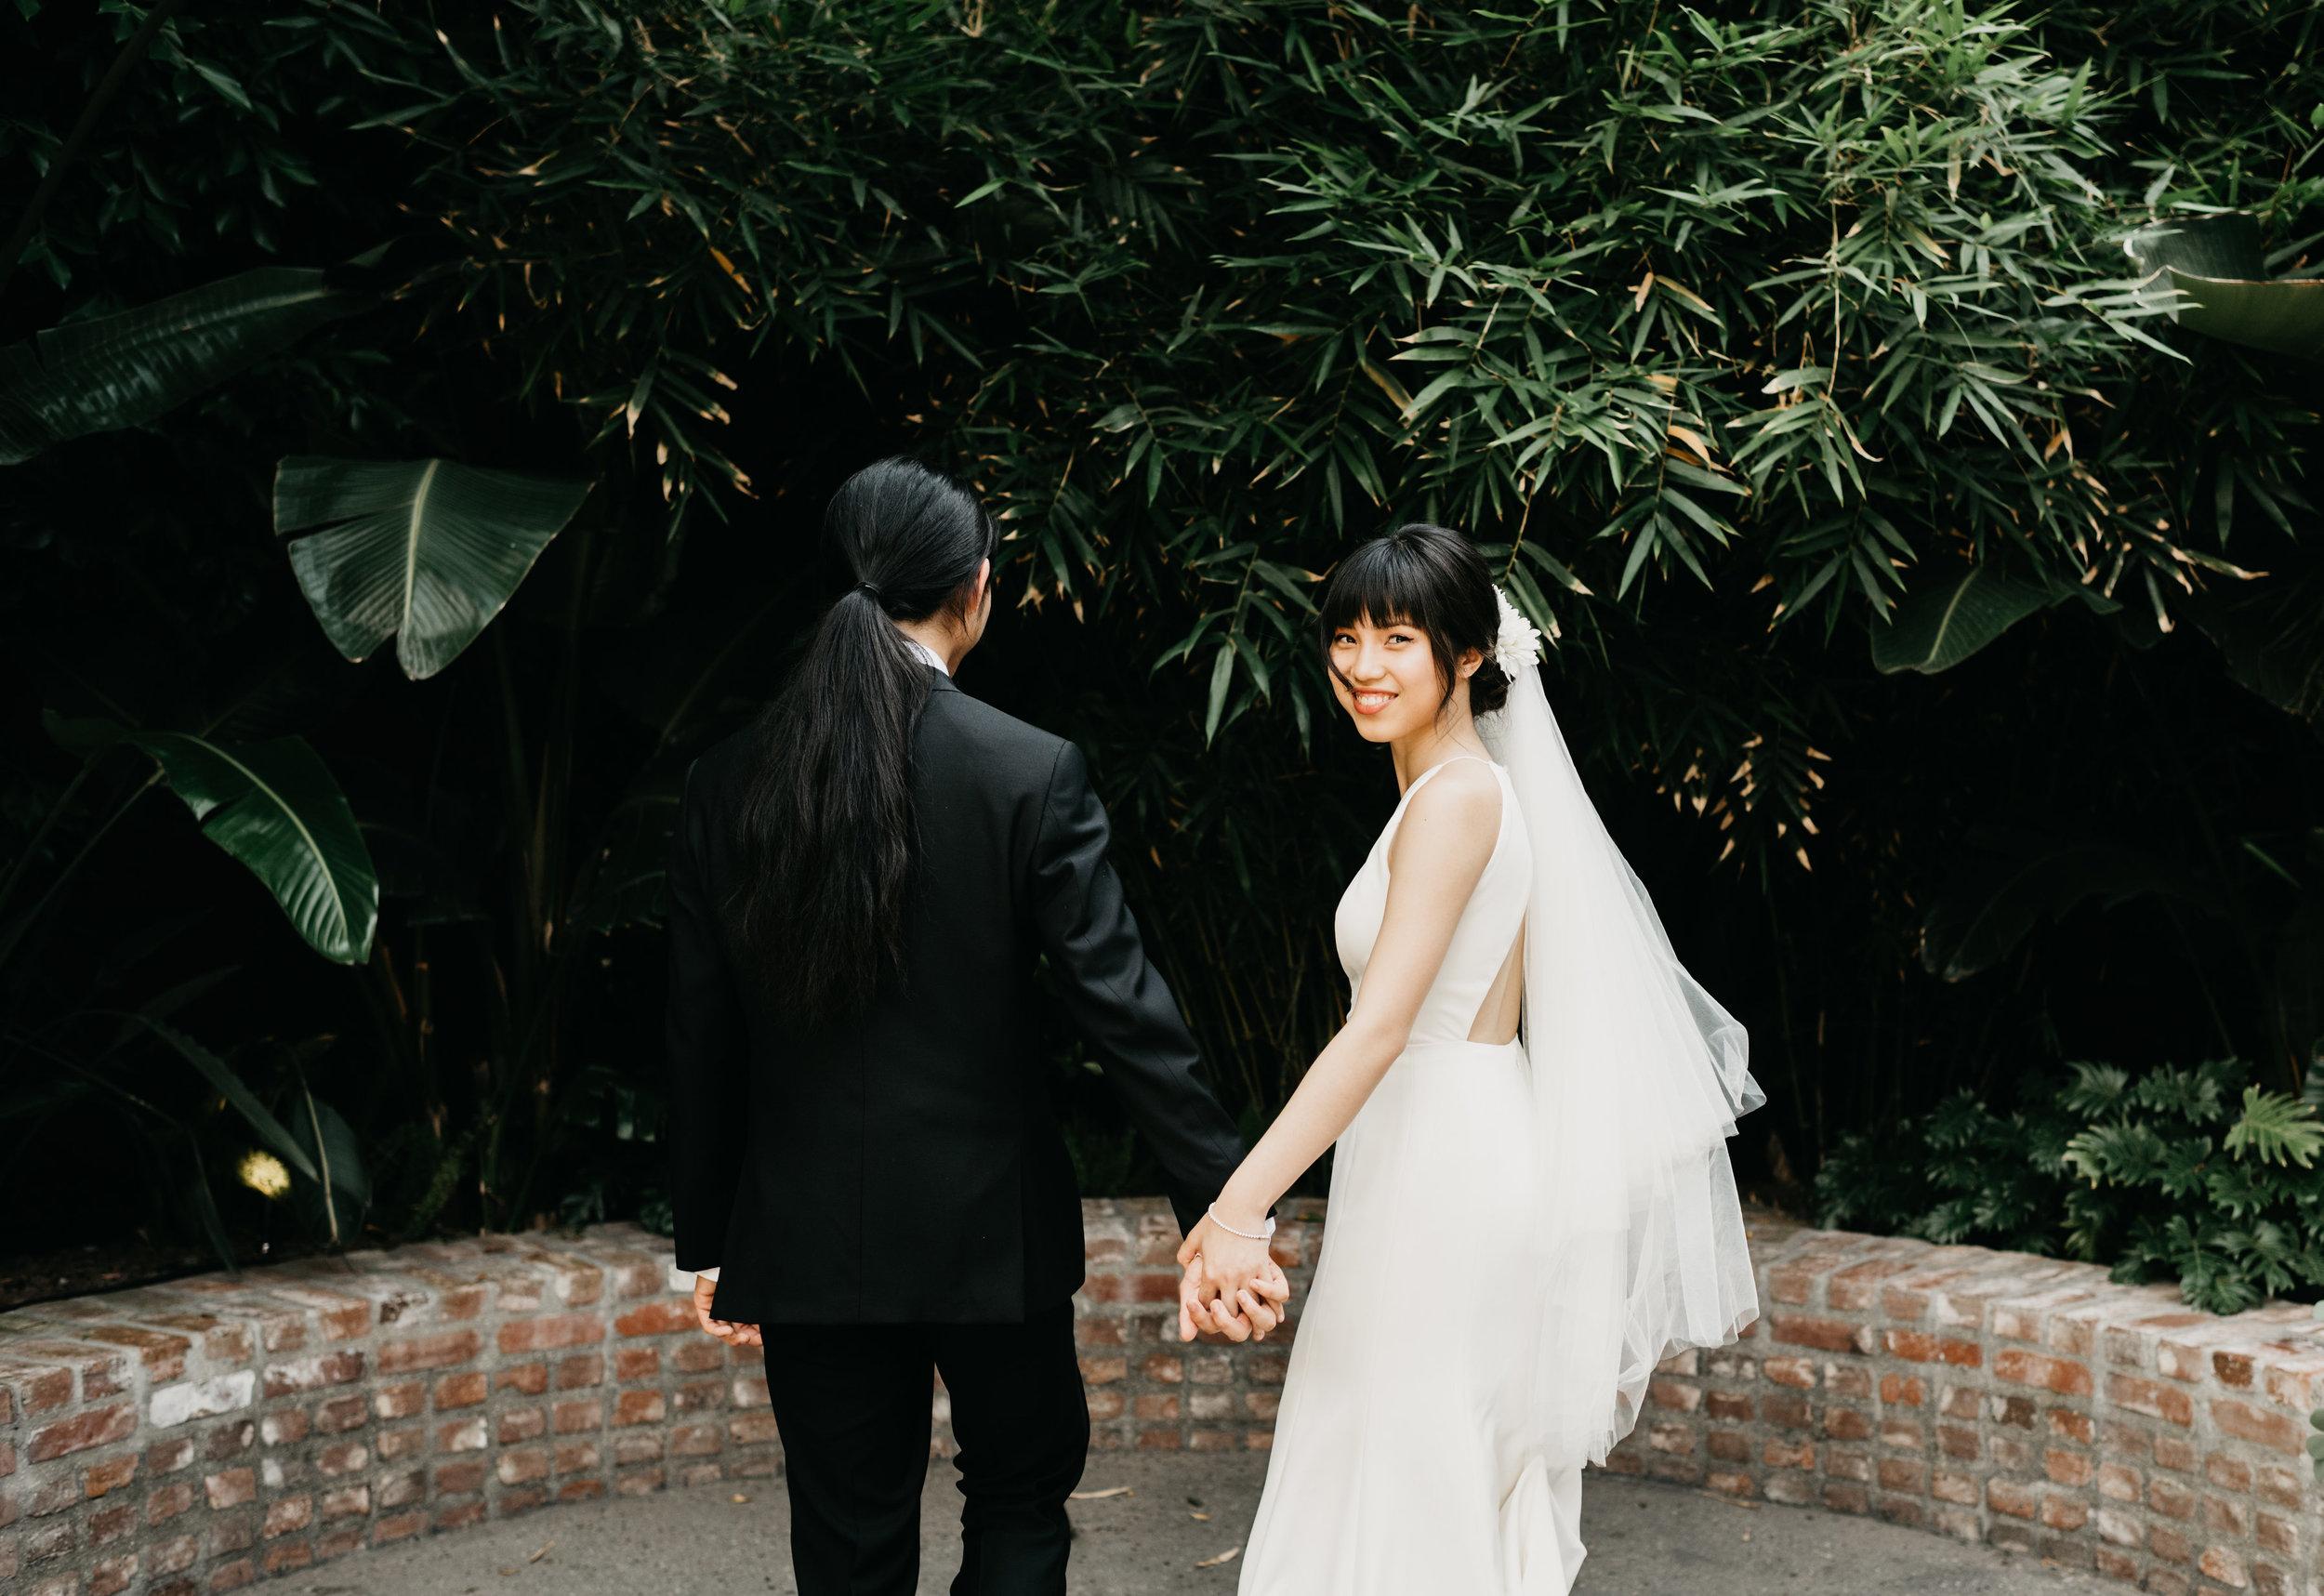 Millwick-wedding-planner40.jpg